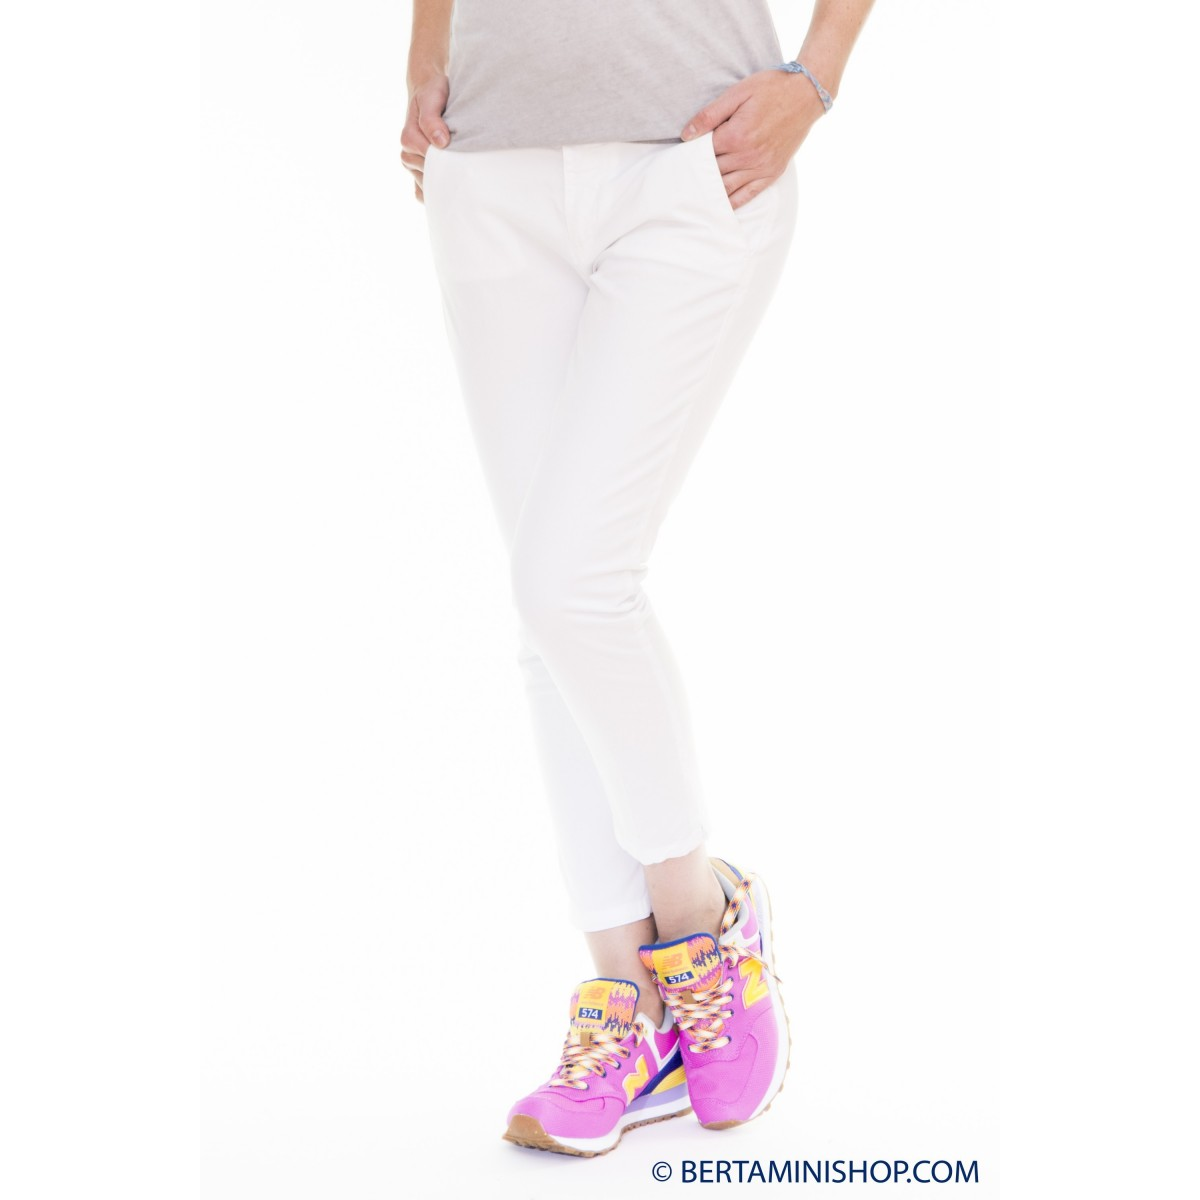 Pantalone 40 West Donna - Melitas 6062 Pantalone Strech 1680